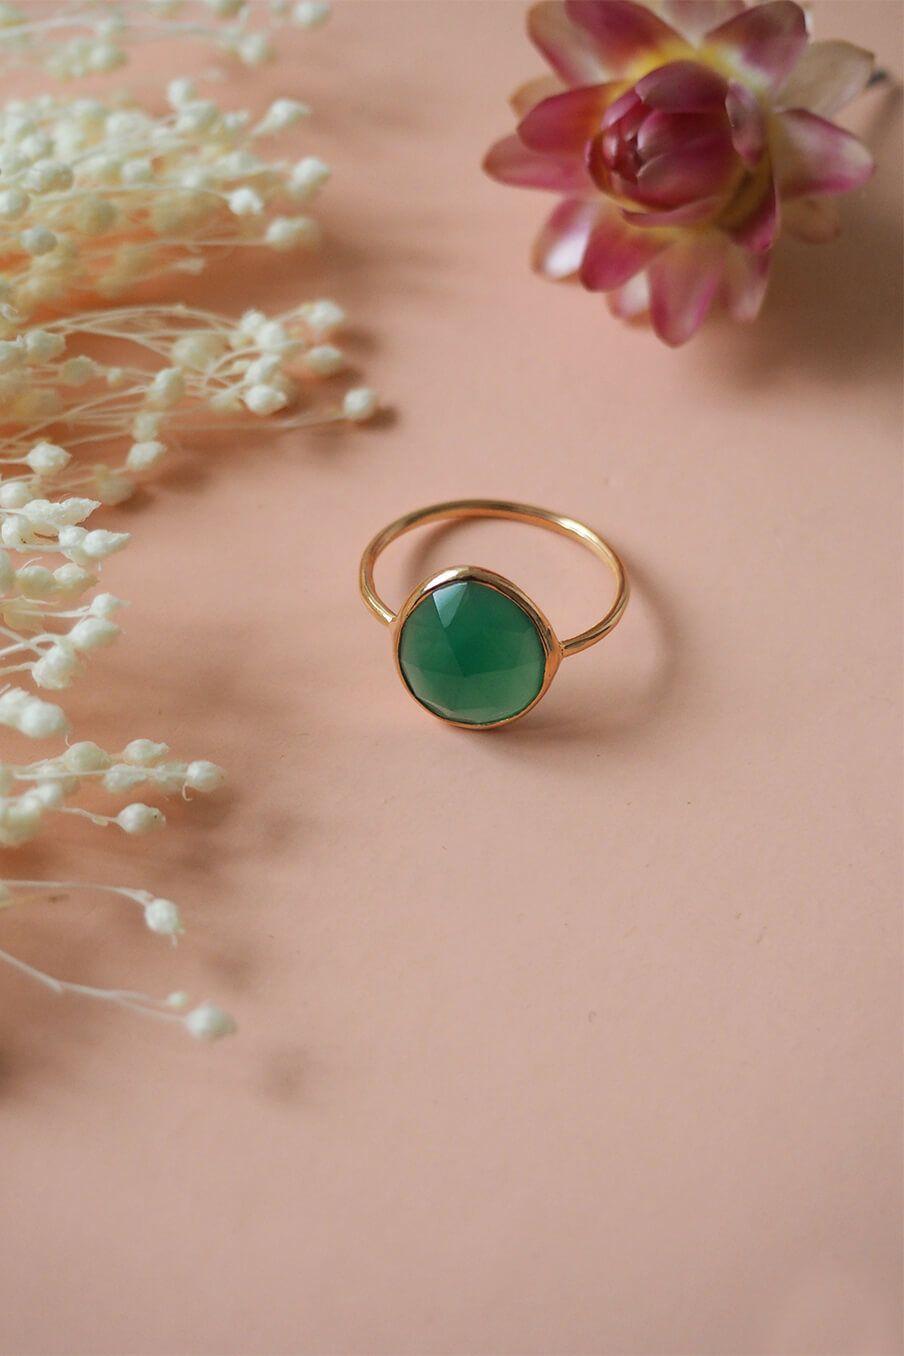 boheme chic vintage bague femme hipi green onyx